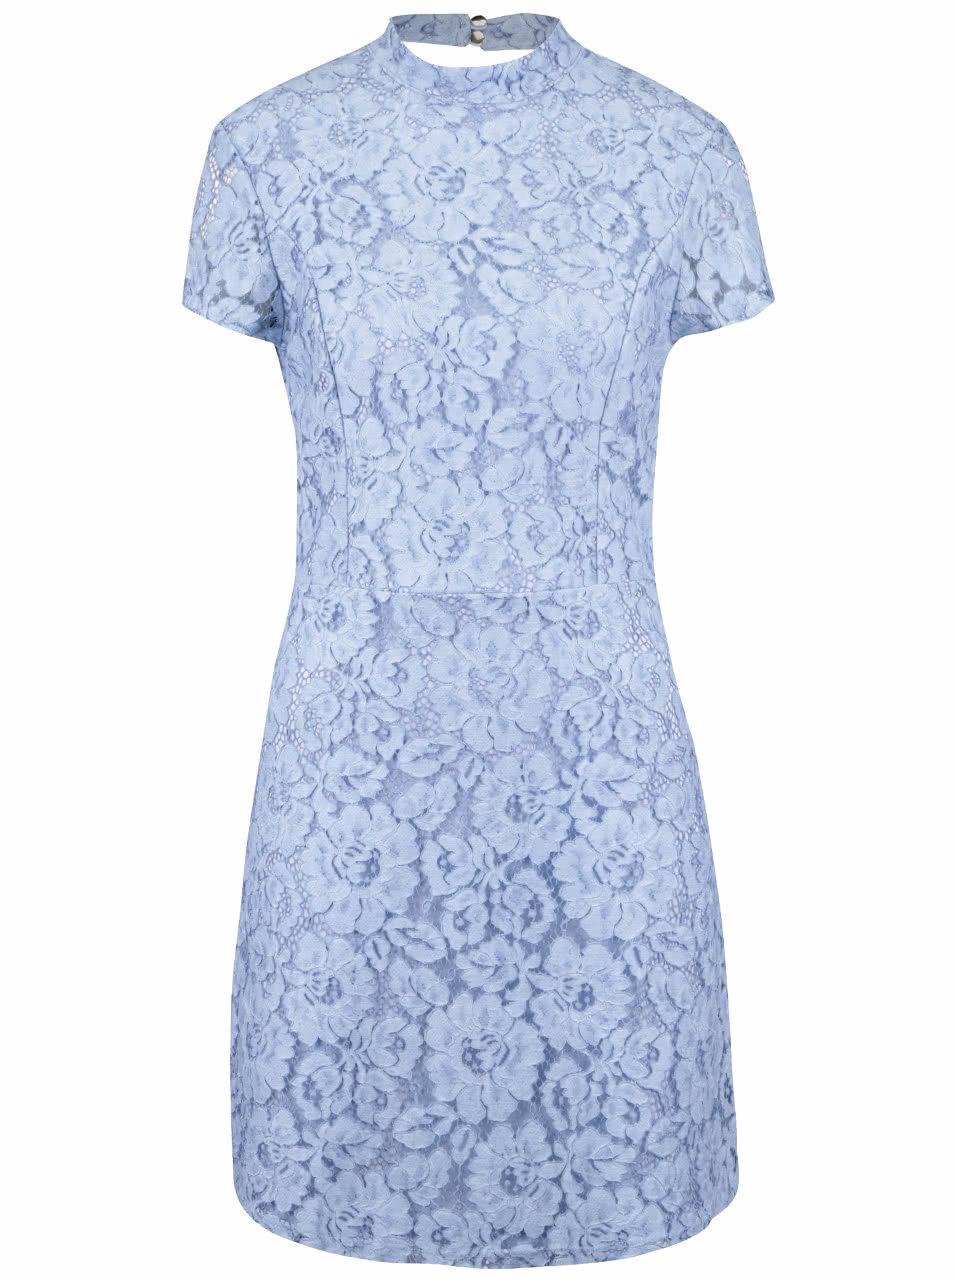 30dd45459ad8 Svetlomodré čipkované šaty Miss Selfridge ...